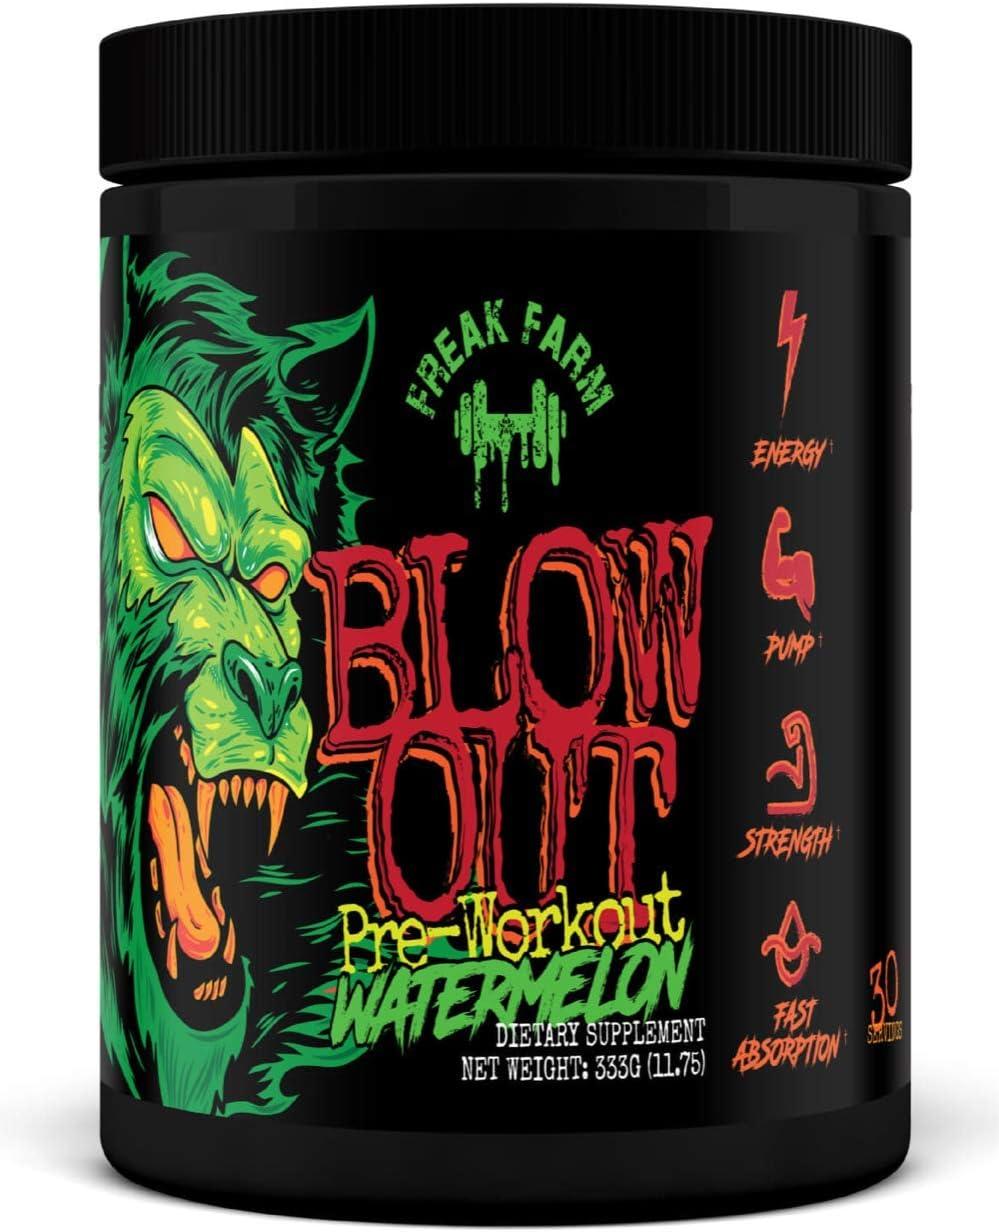 Outlet sale feature Blowout Pre-Workout Watermelon Long Focus Max 81% OFF Energy Pum Lasting